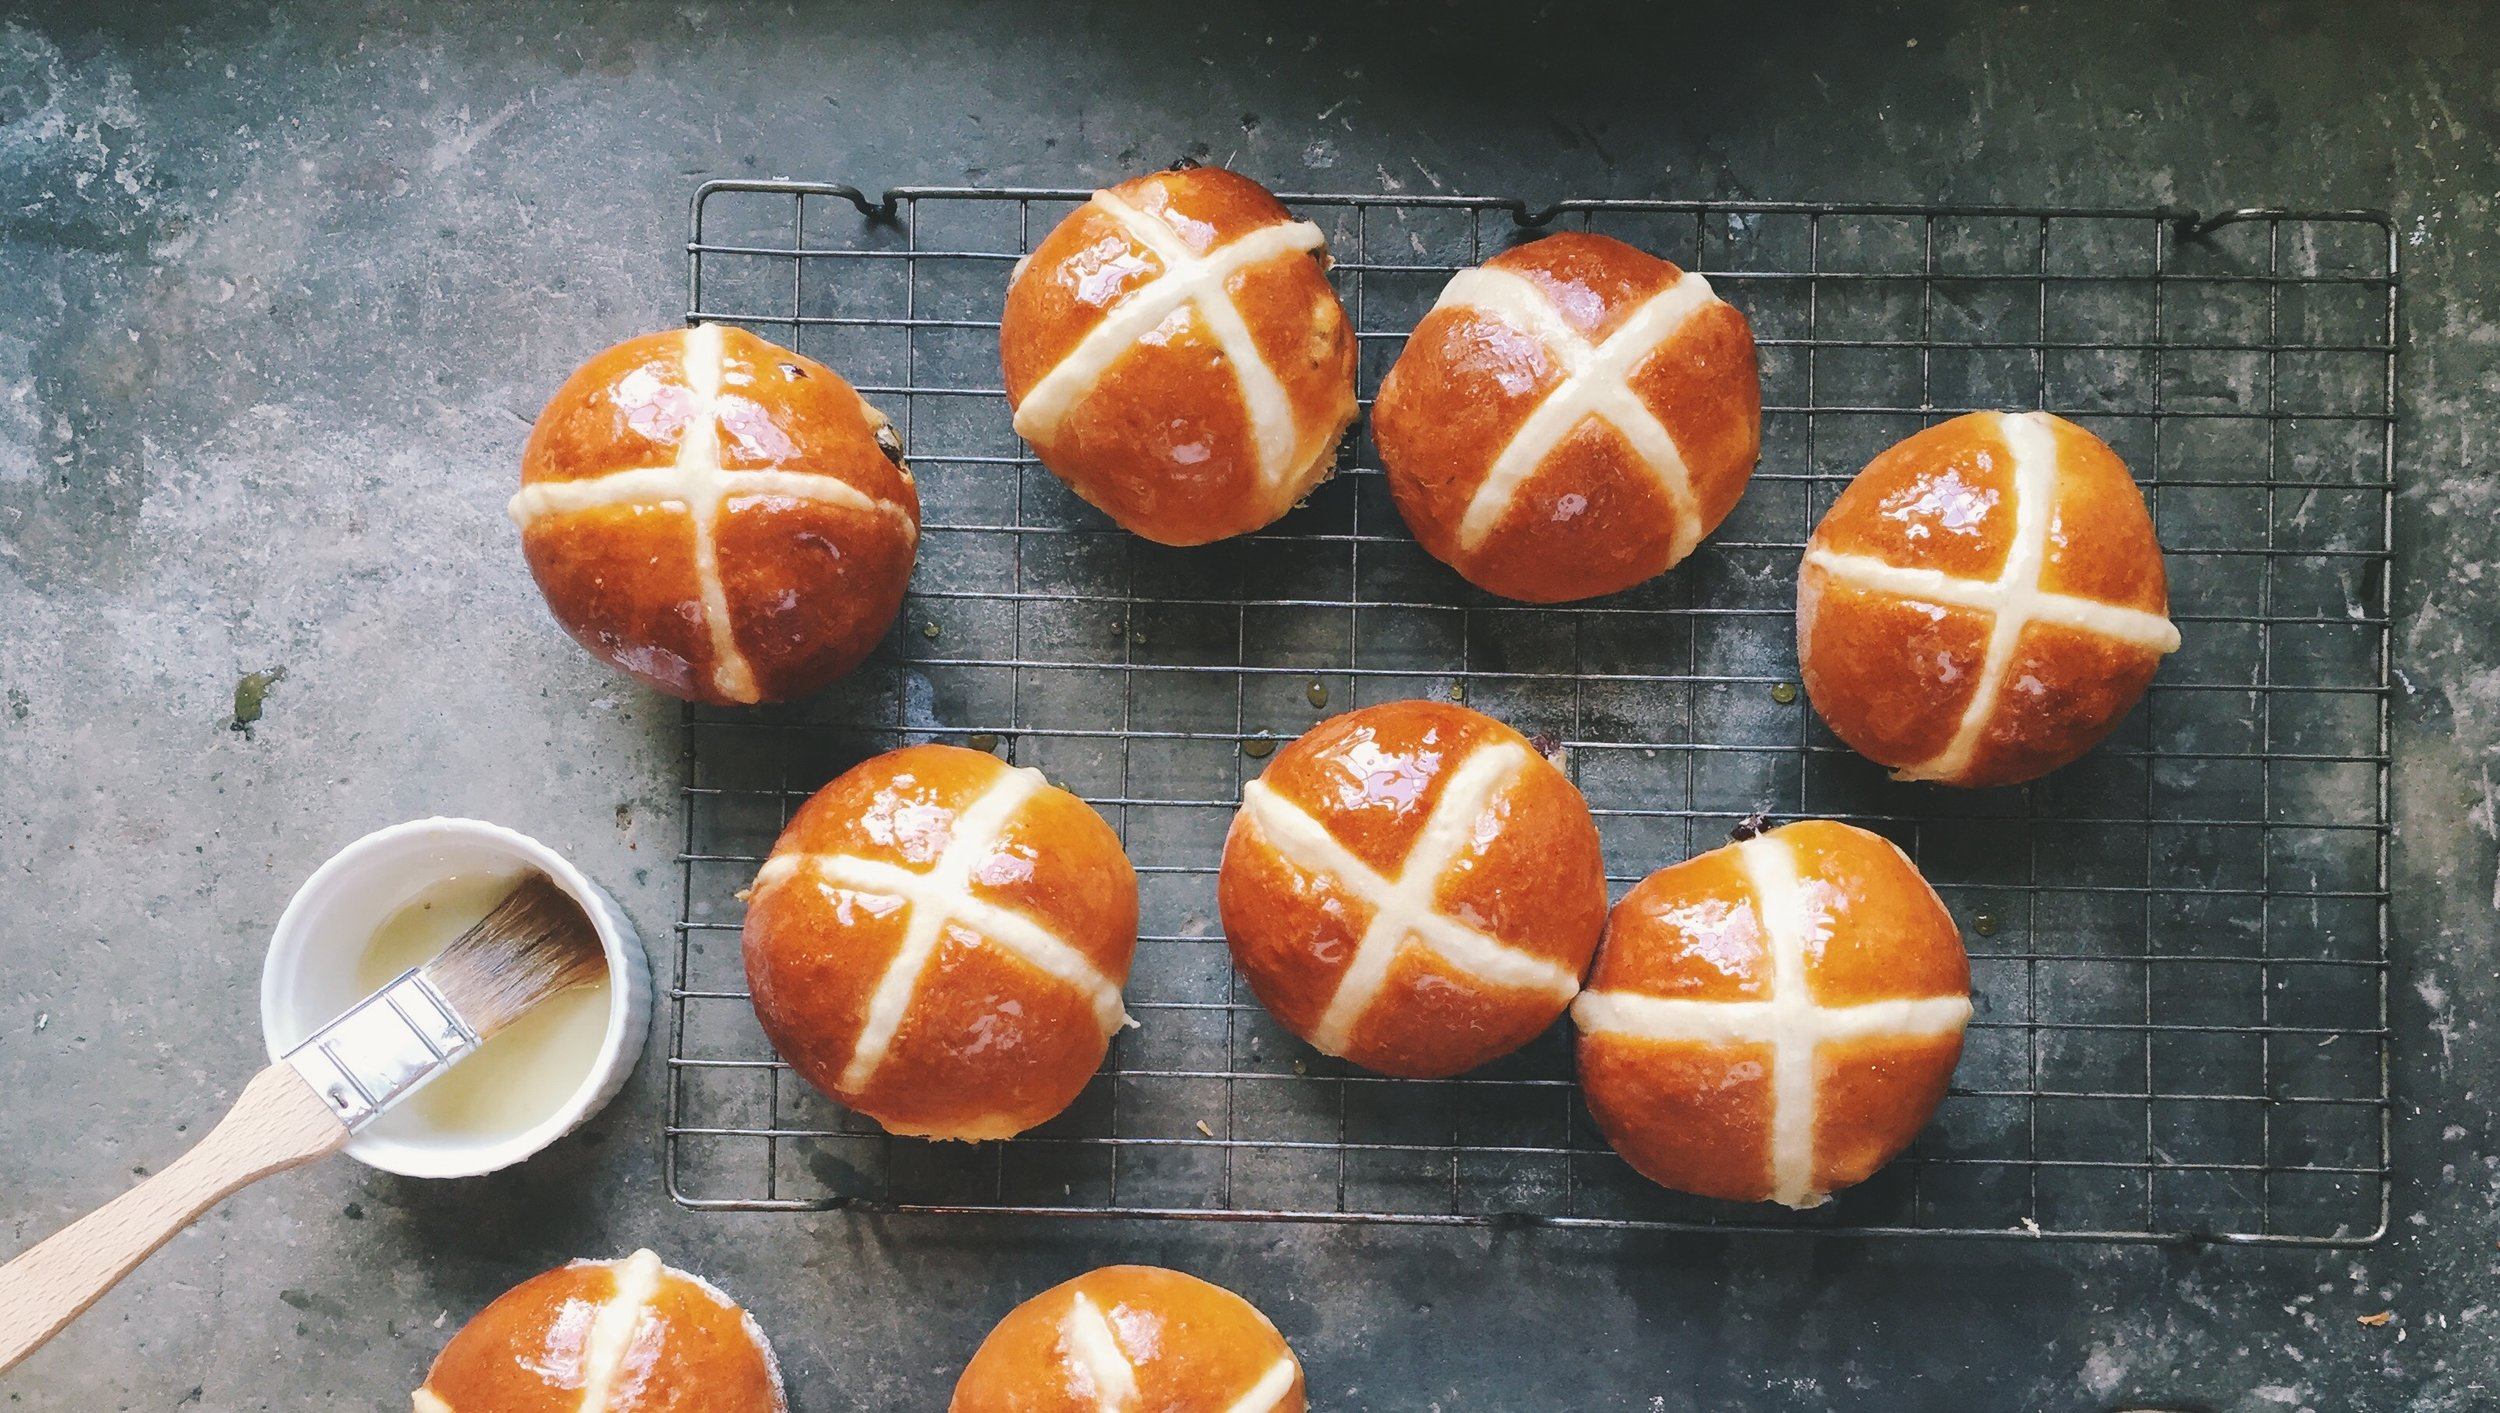 The Hill Food Company hot cross buns